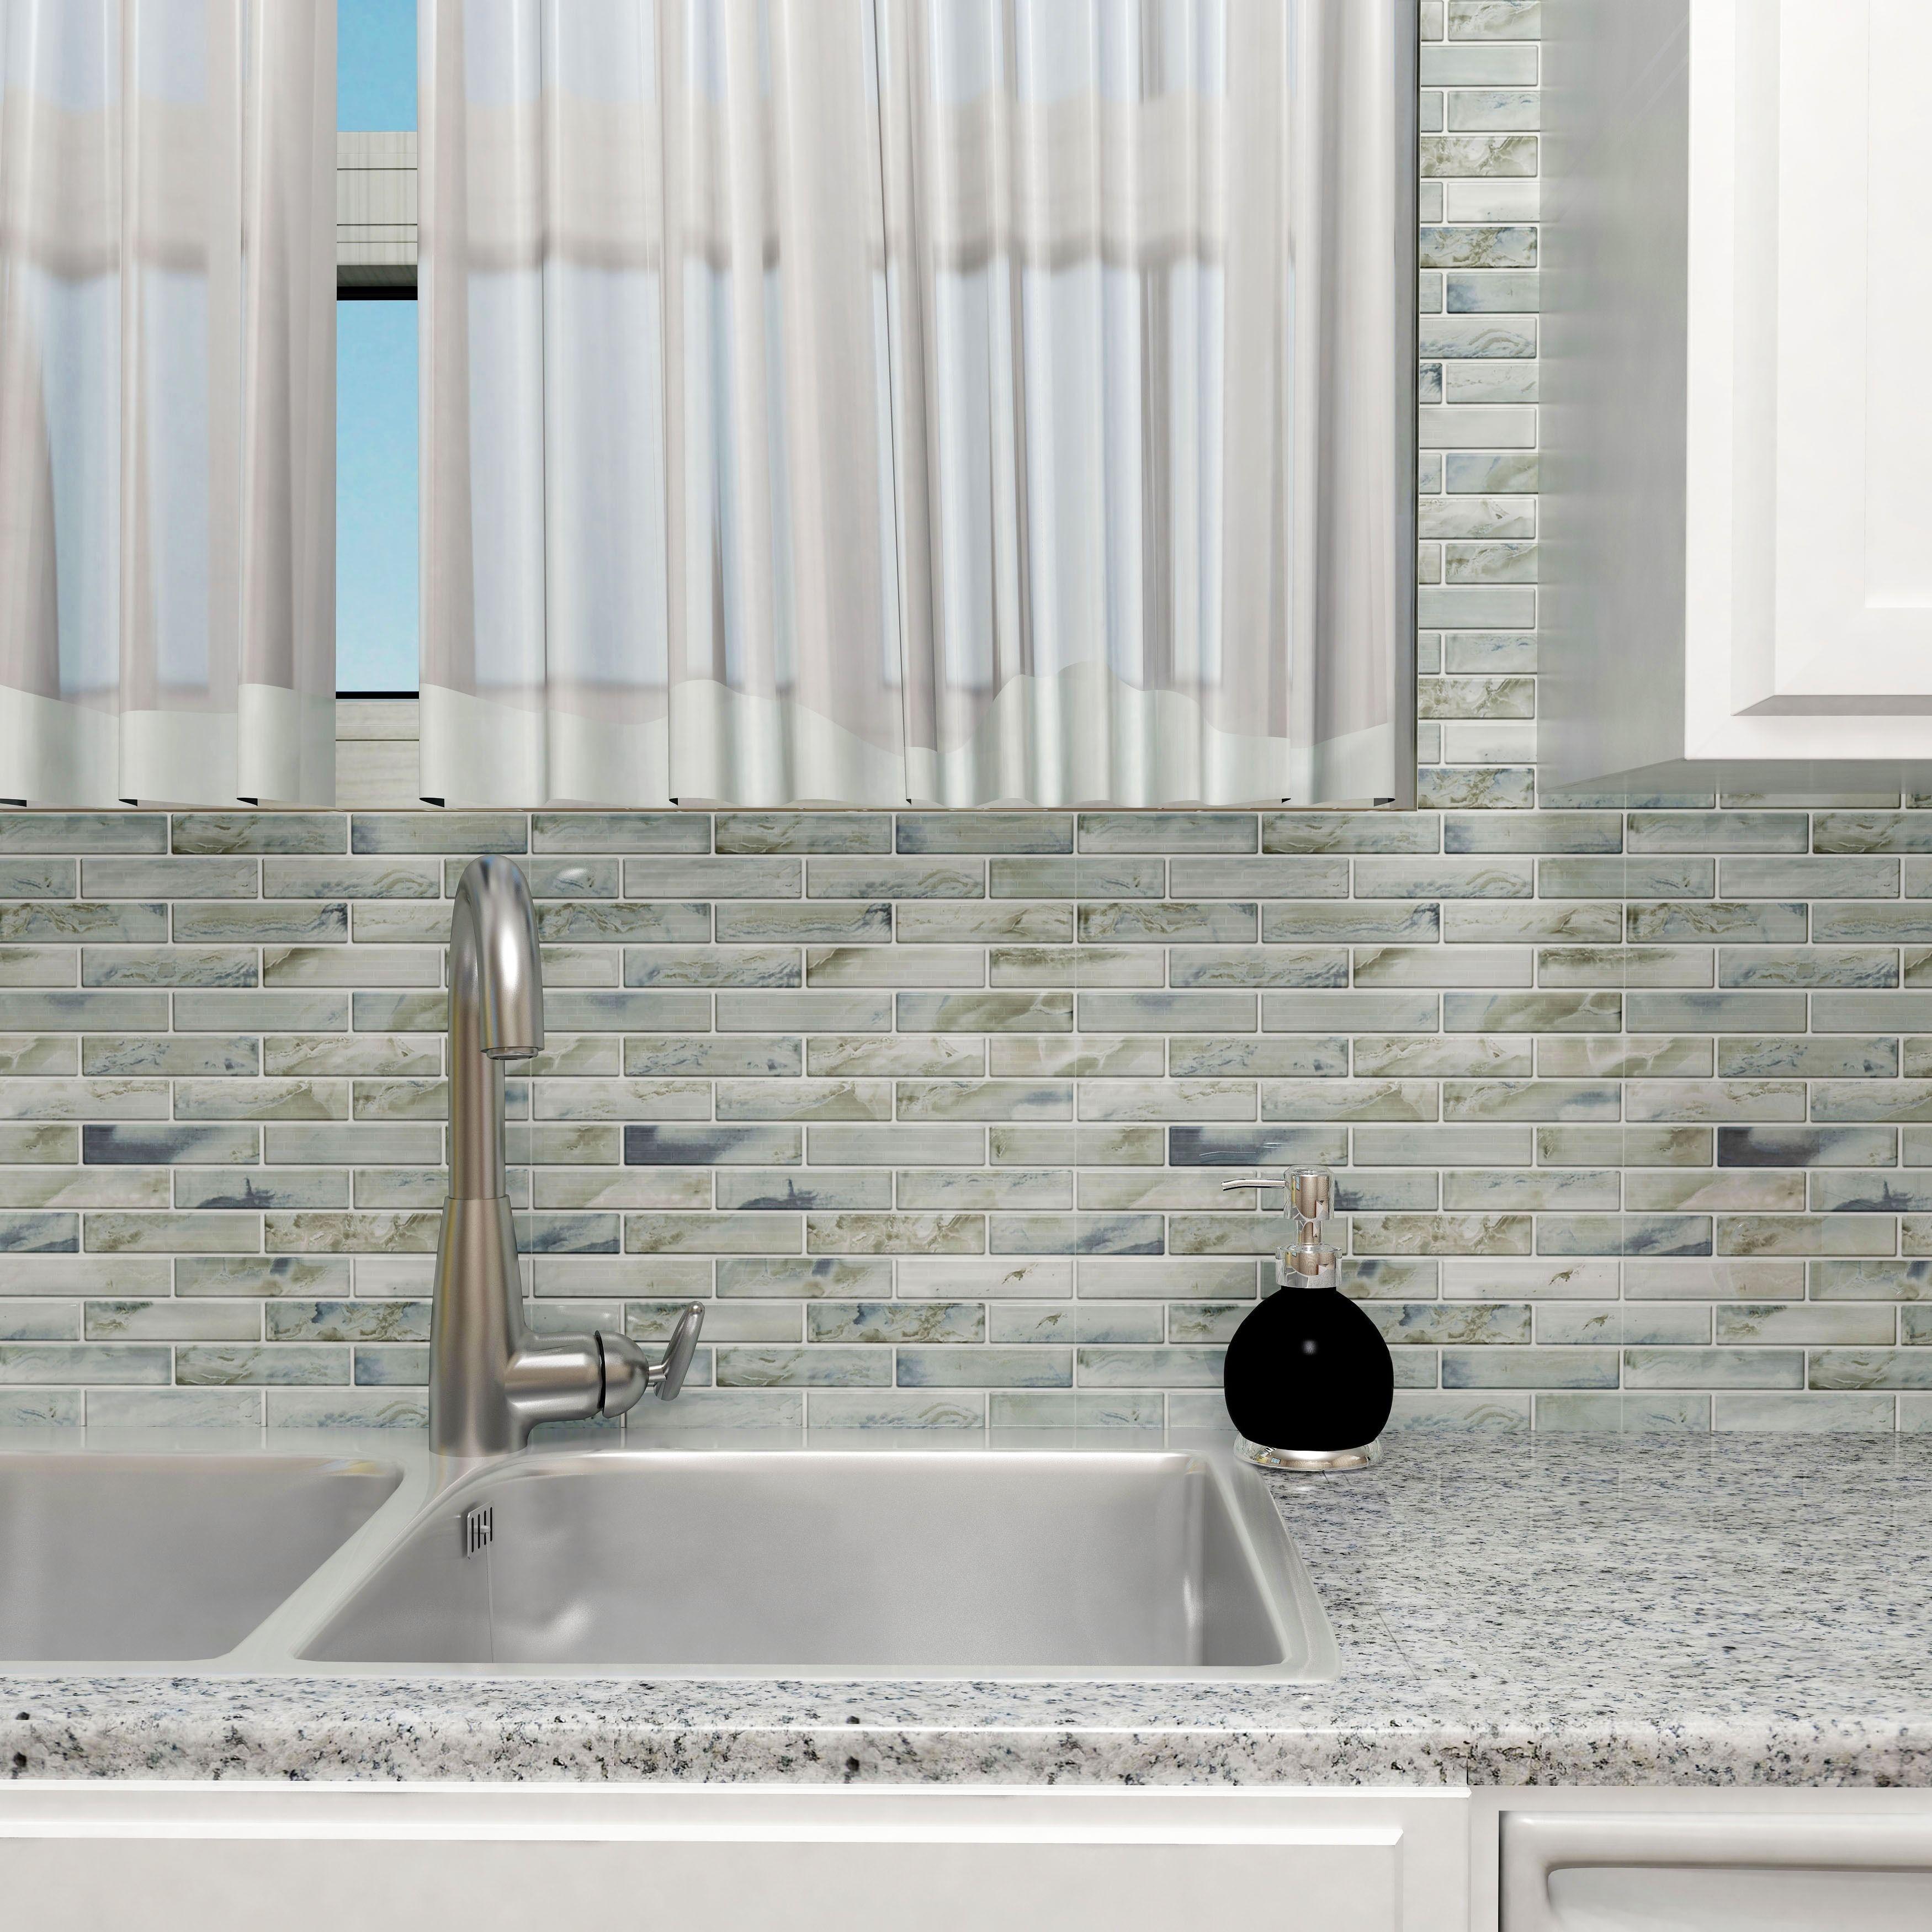 SomerTile 1175x12 inch Stunning Brick Silver Glass Mosaic